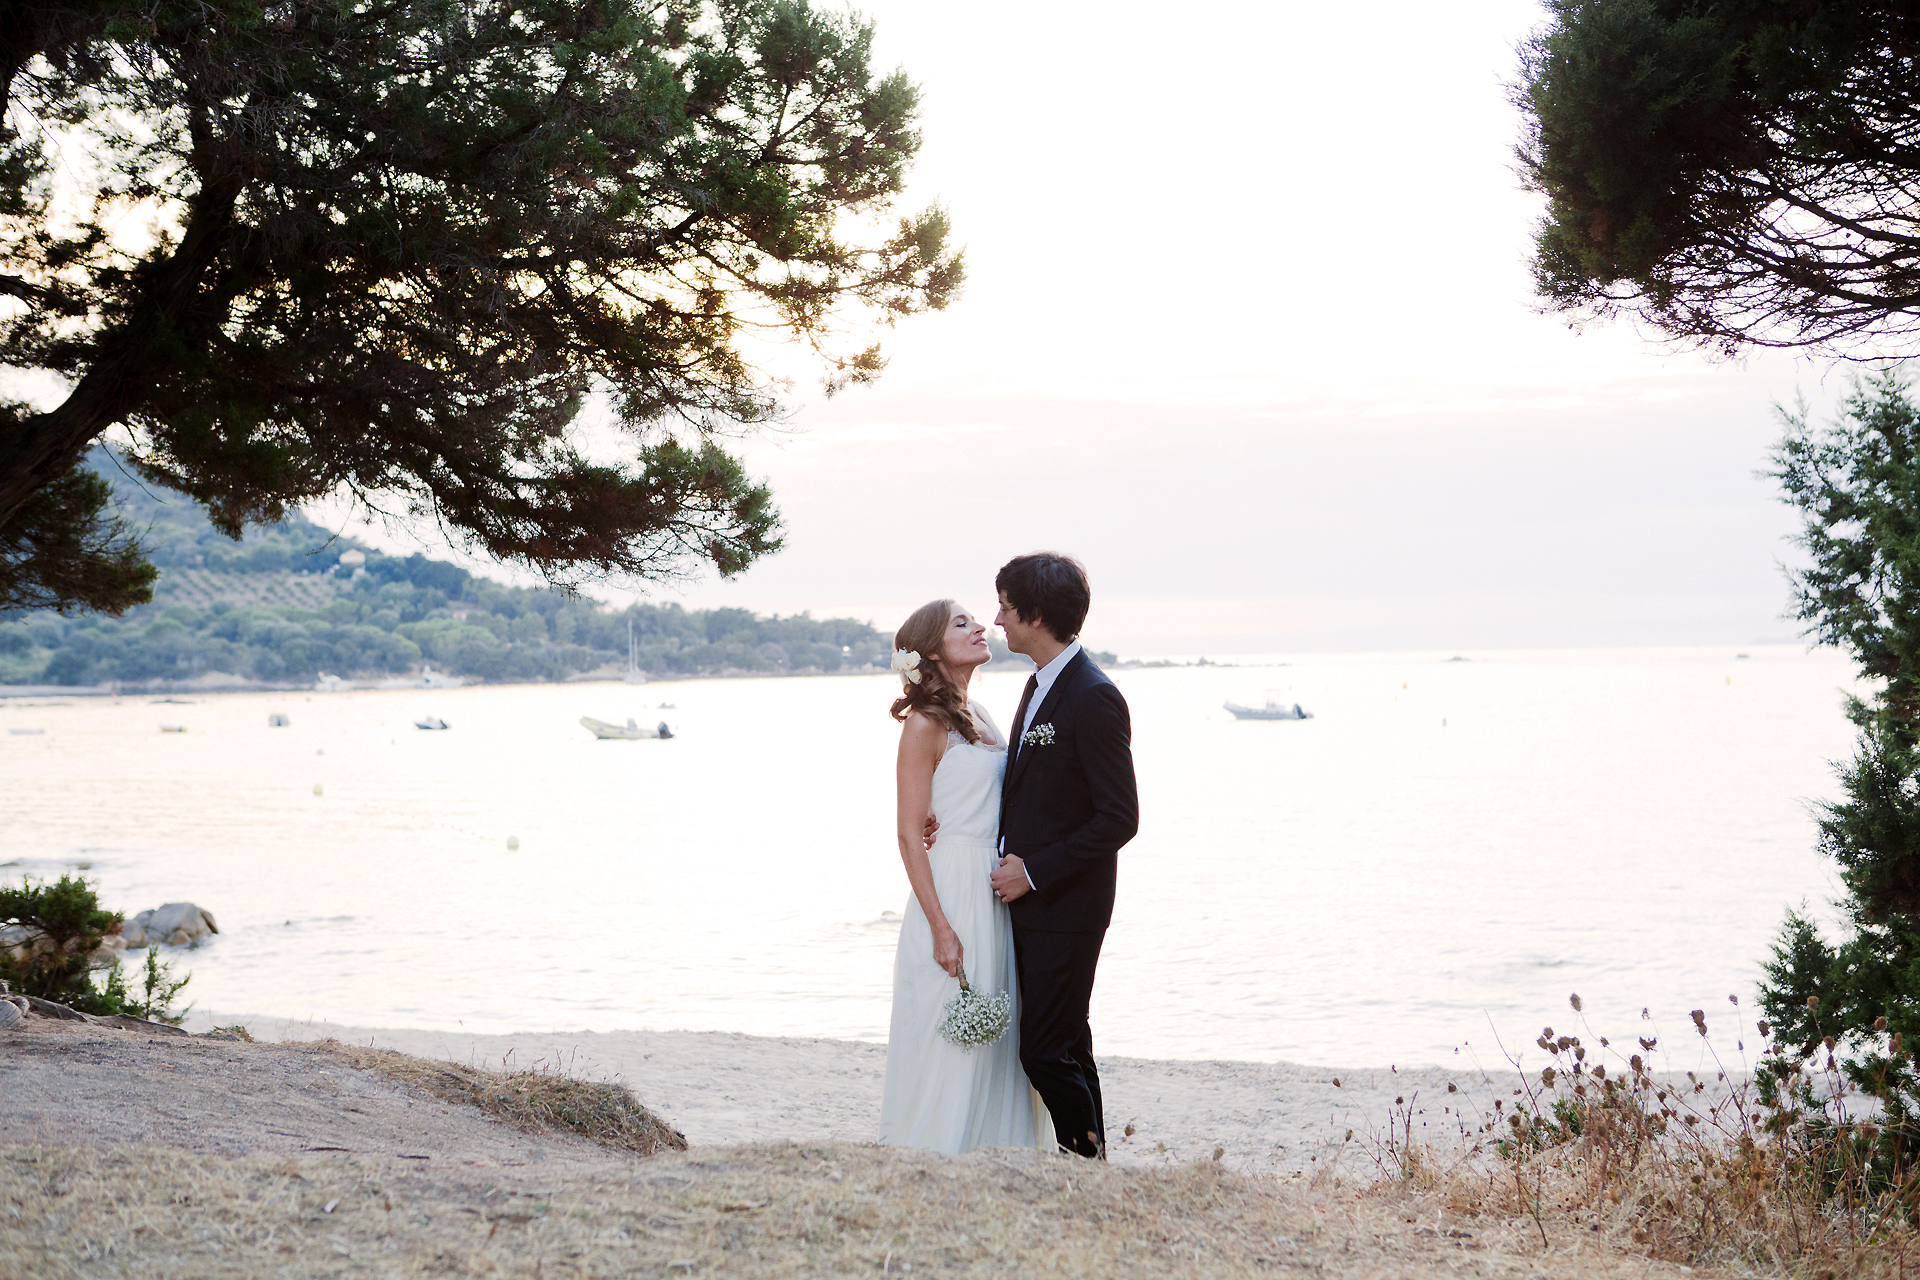 photographe-mariage-oise-paris-chantilly-senlis-keith-flament